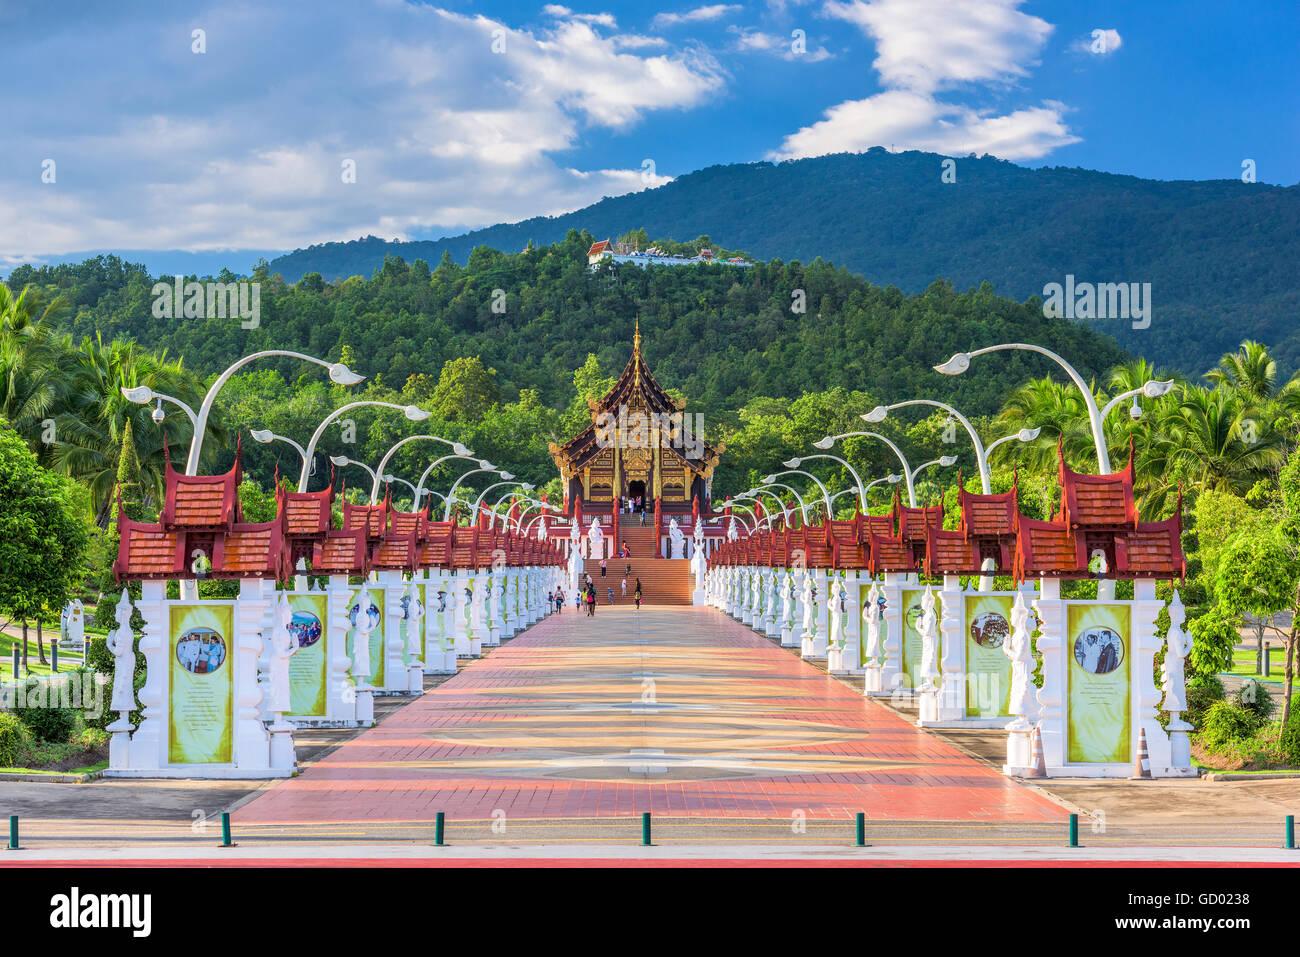 CHIANG MAI, Tailandia - Octubre 15, 2015: la pasarela para el Pabellón de Royal Flora Ratchaphruek Park. Imagen De Stock